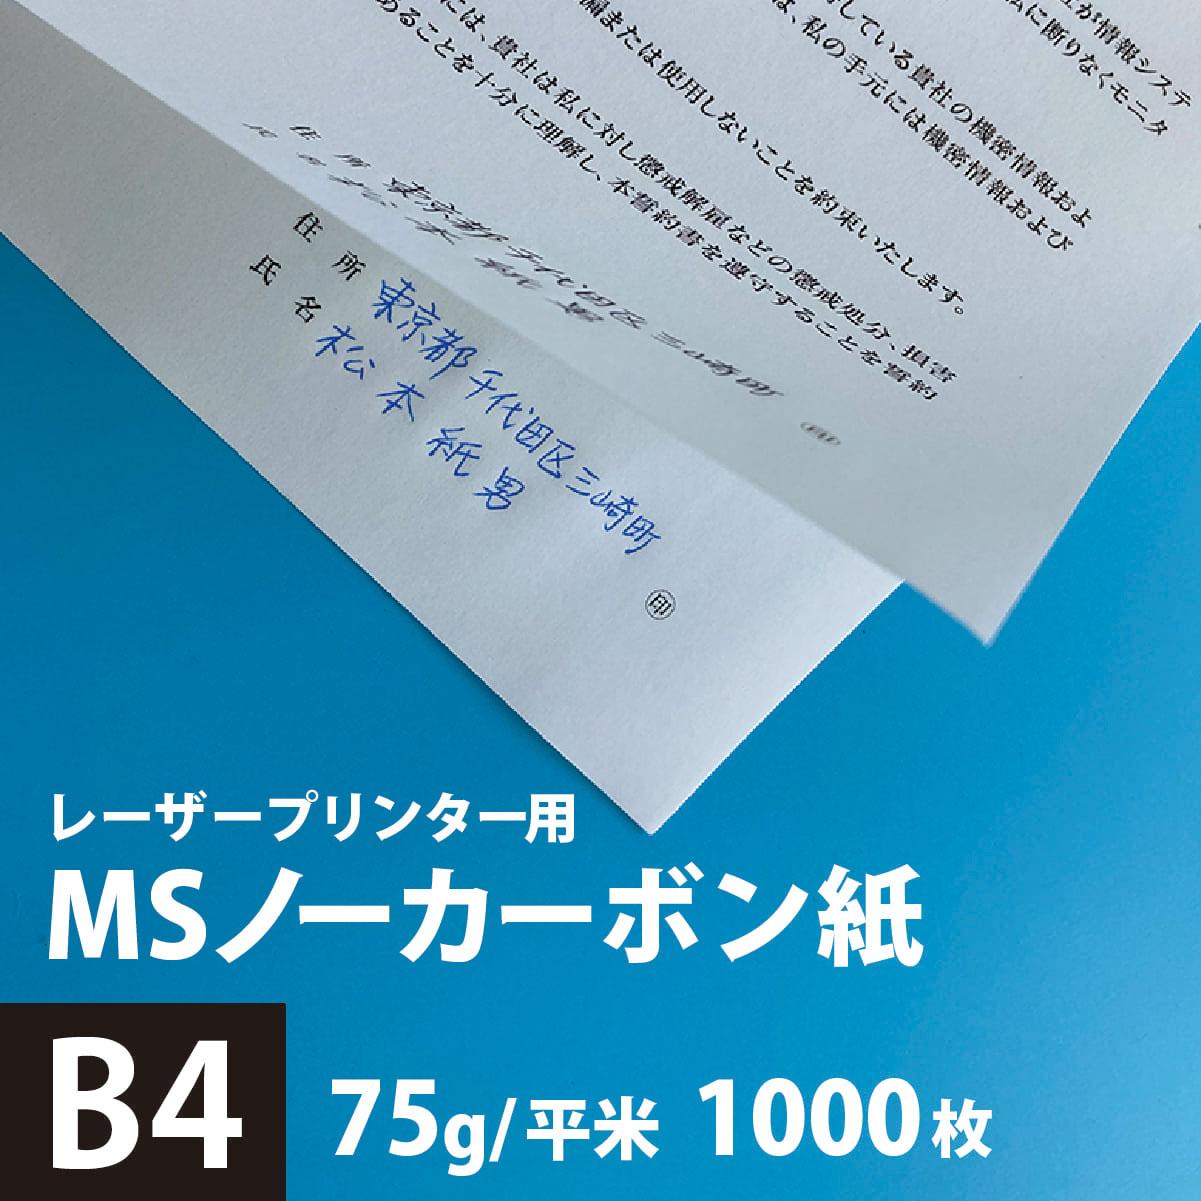 MSノーカーボン紙N50 75g/平米 B4サイズ:1000枚, 複写 印刷紙 印刷用紙 複写紙 レーザープリンター用 複写用伝票用紙 伝票印刷 複写用紙 帳票作成 メモ用紙 領収書印刷 松本洋紙店